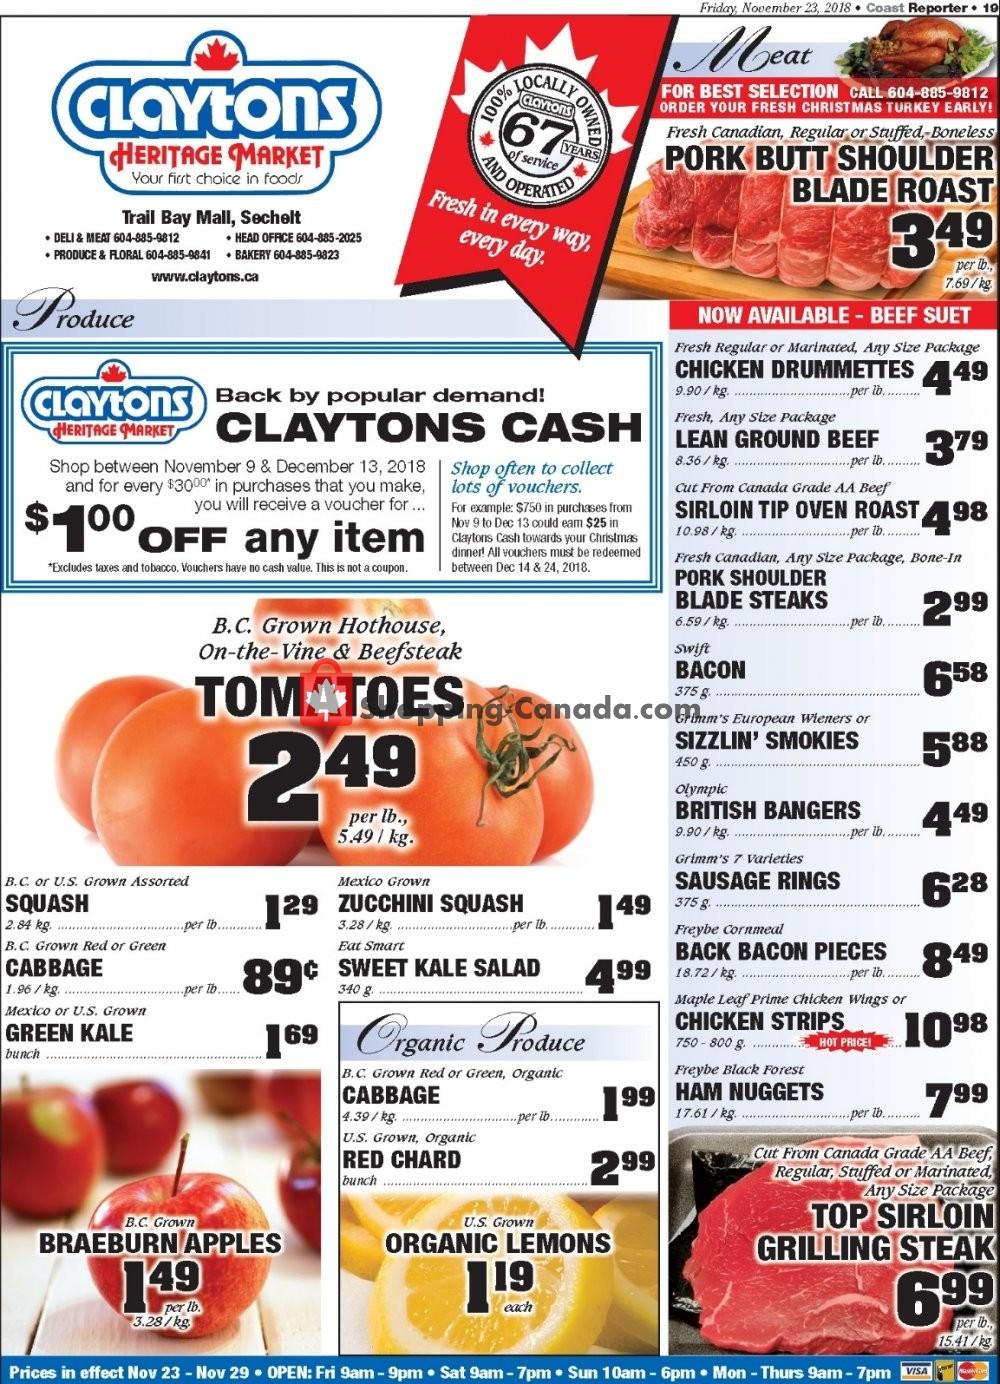 Flyer Claytons Heritage Market Canada - from Friday November 23, 2018 to Thursday November 29, 2018